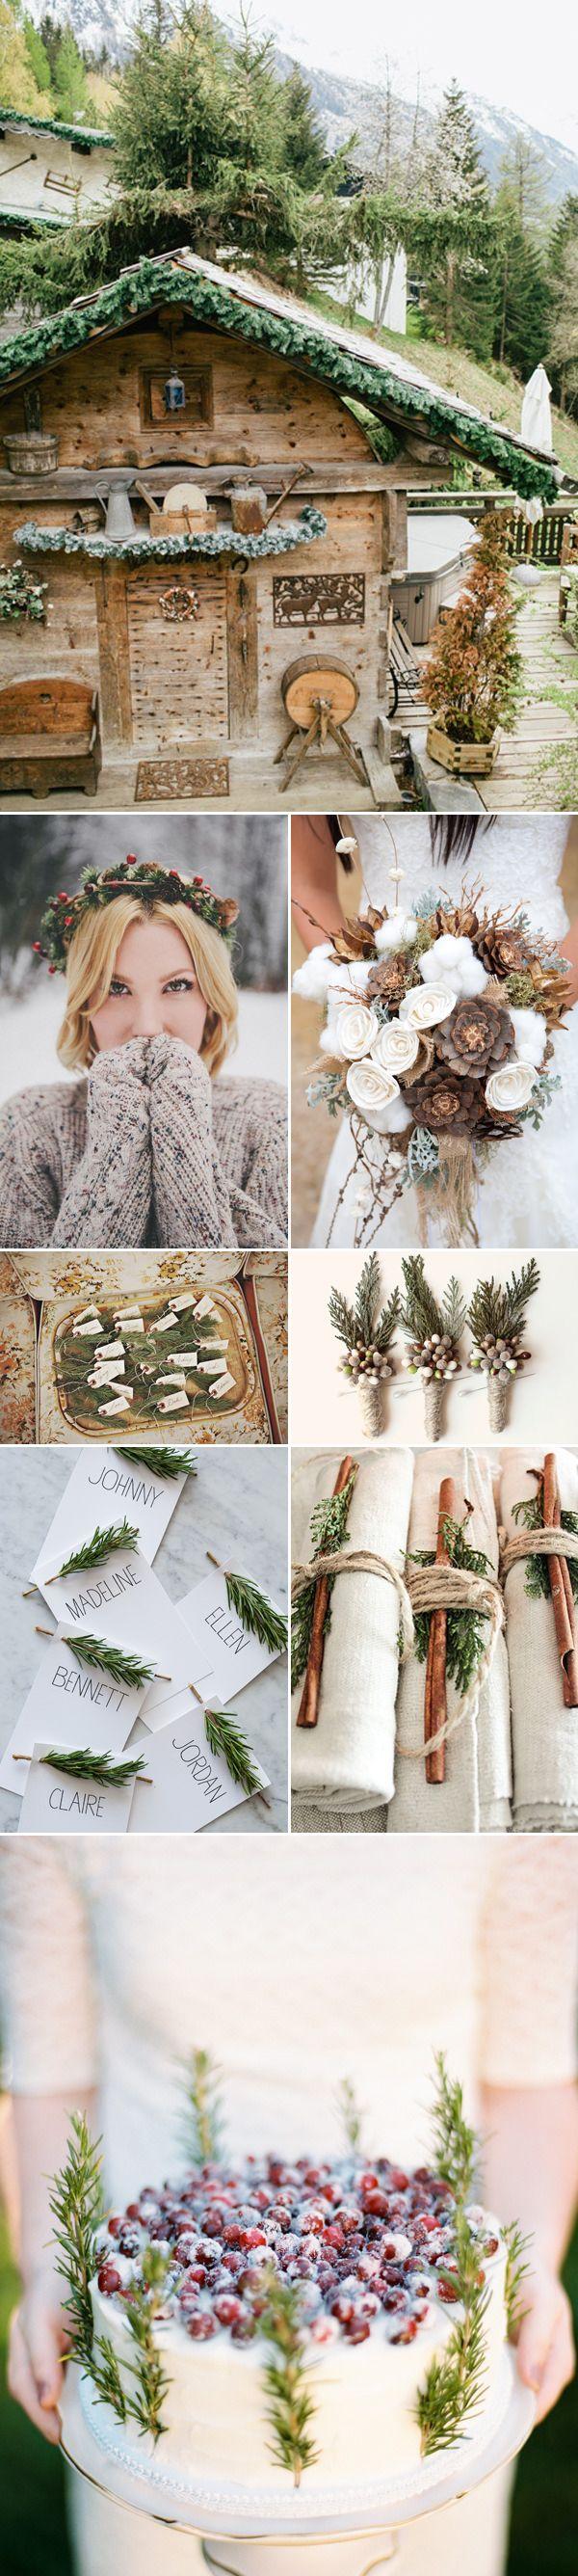 'tis the season - rustic mountain winter wedding inspiration | via junebugweddings.com